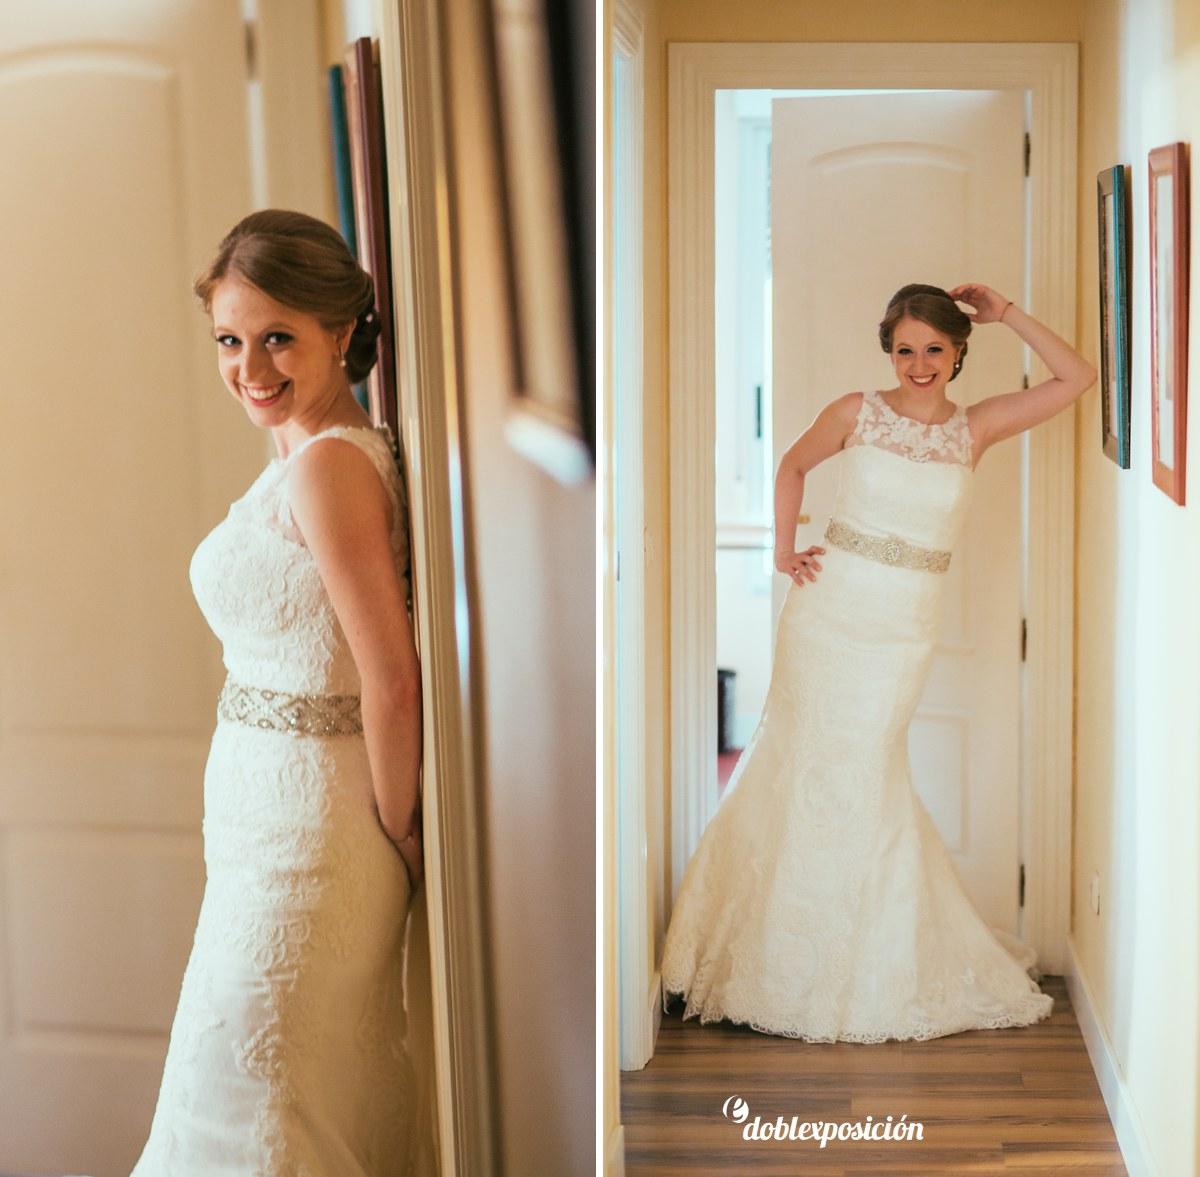 fotografos-boda-campo-masia-finca-el-lago-elche-alicante_0012